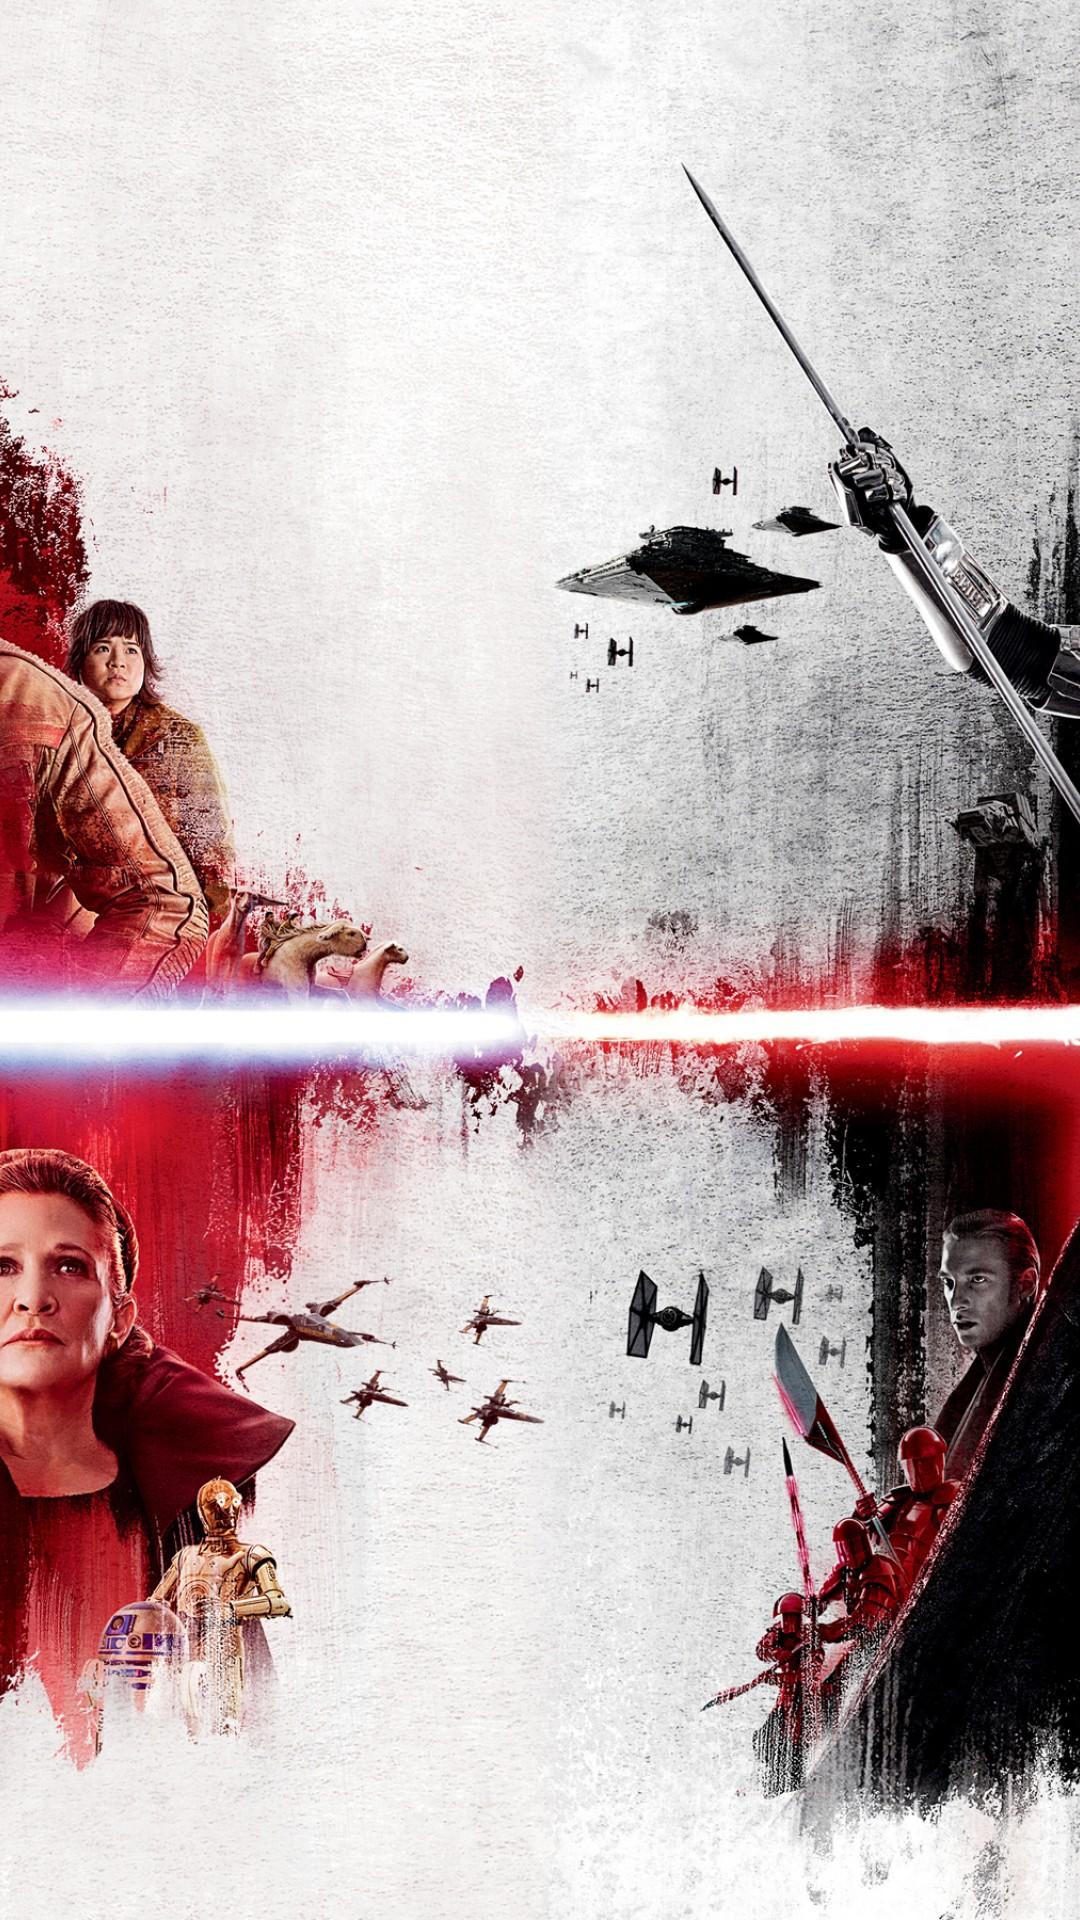 Star Wars The Last Jedi Hd Wallpaper For Desktop And Mobiles